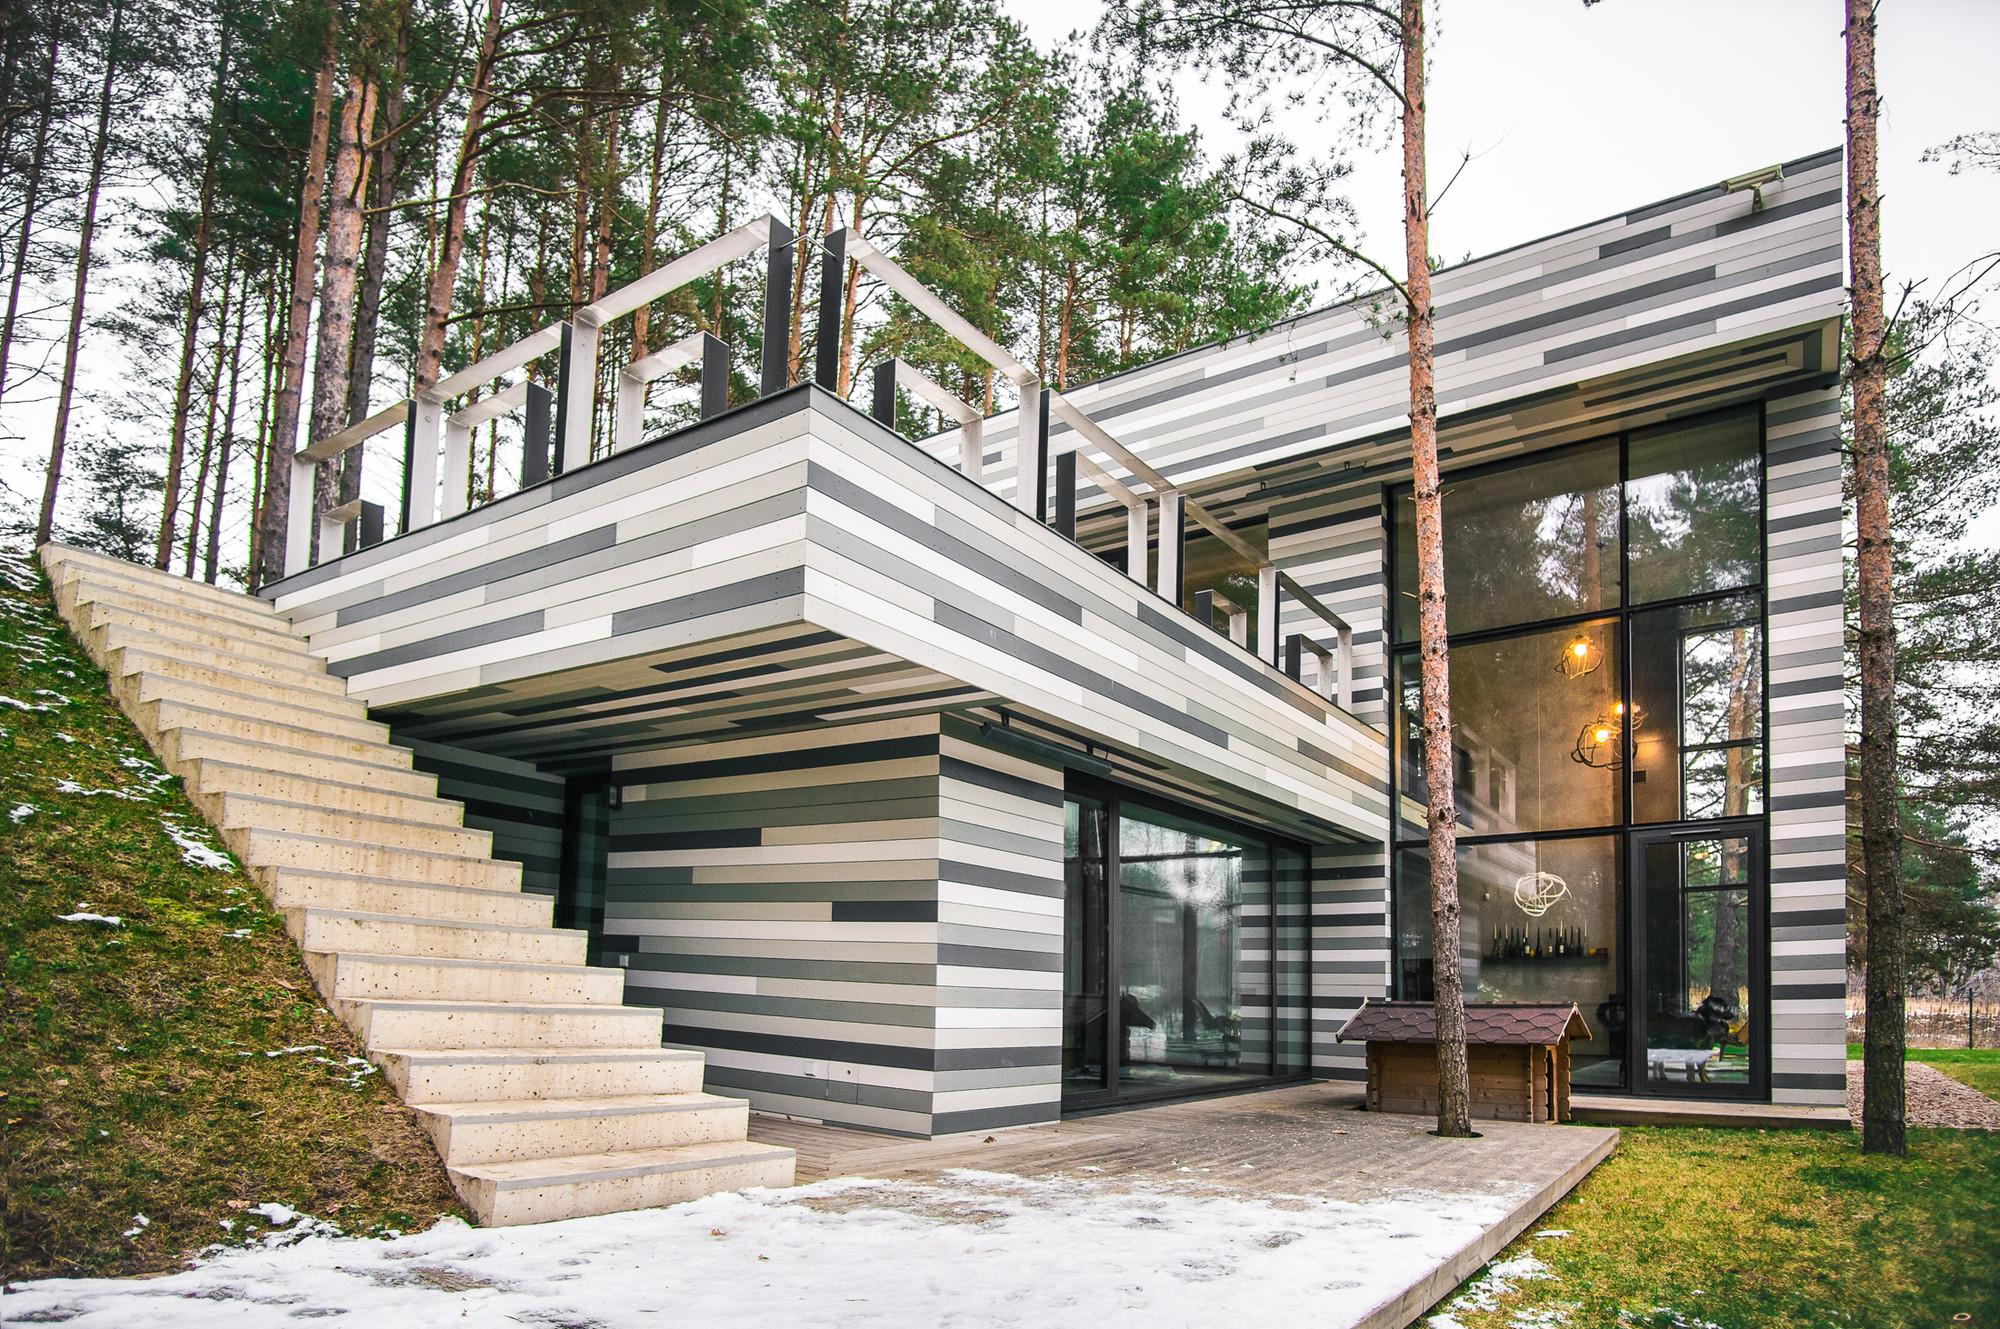 House Villa near Vilnius / GYZA, © Antanas Minkevičius